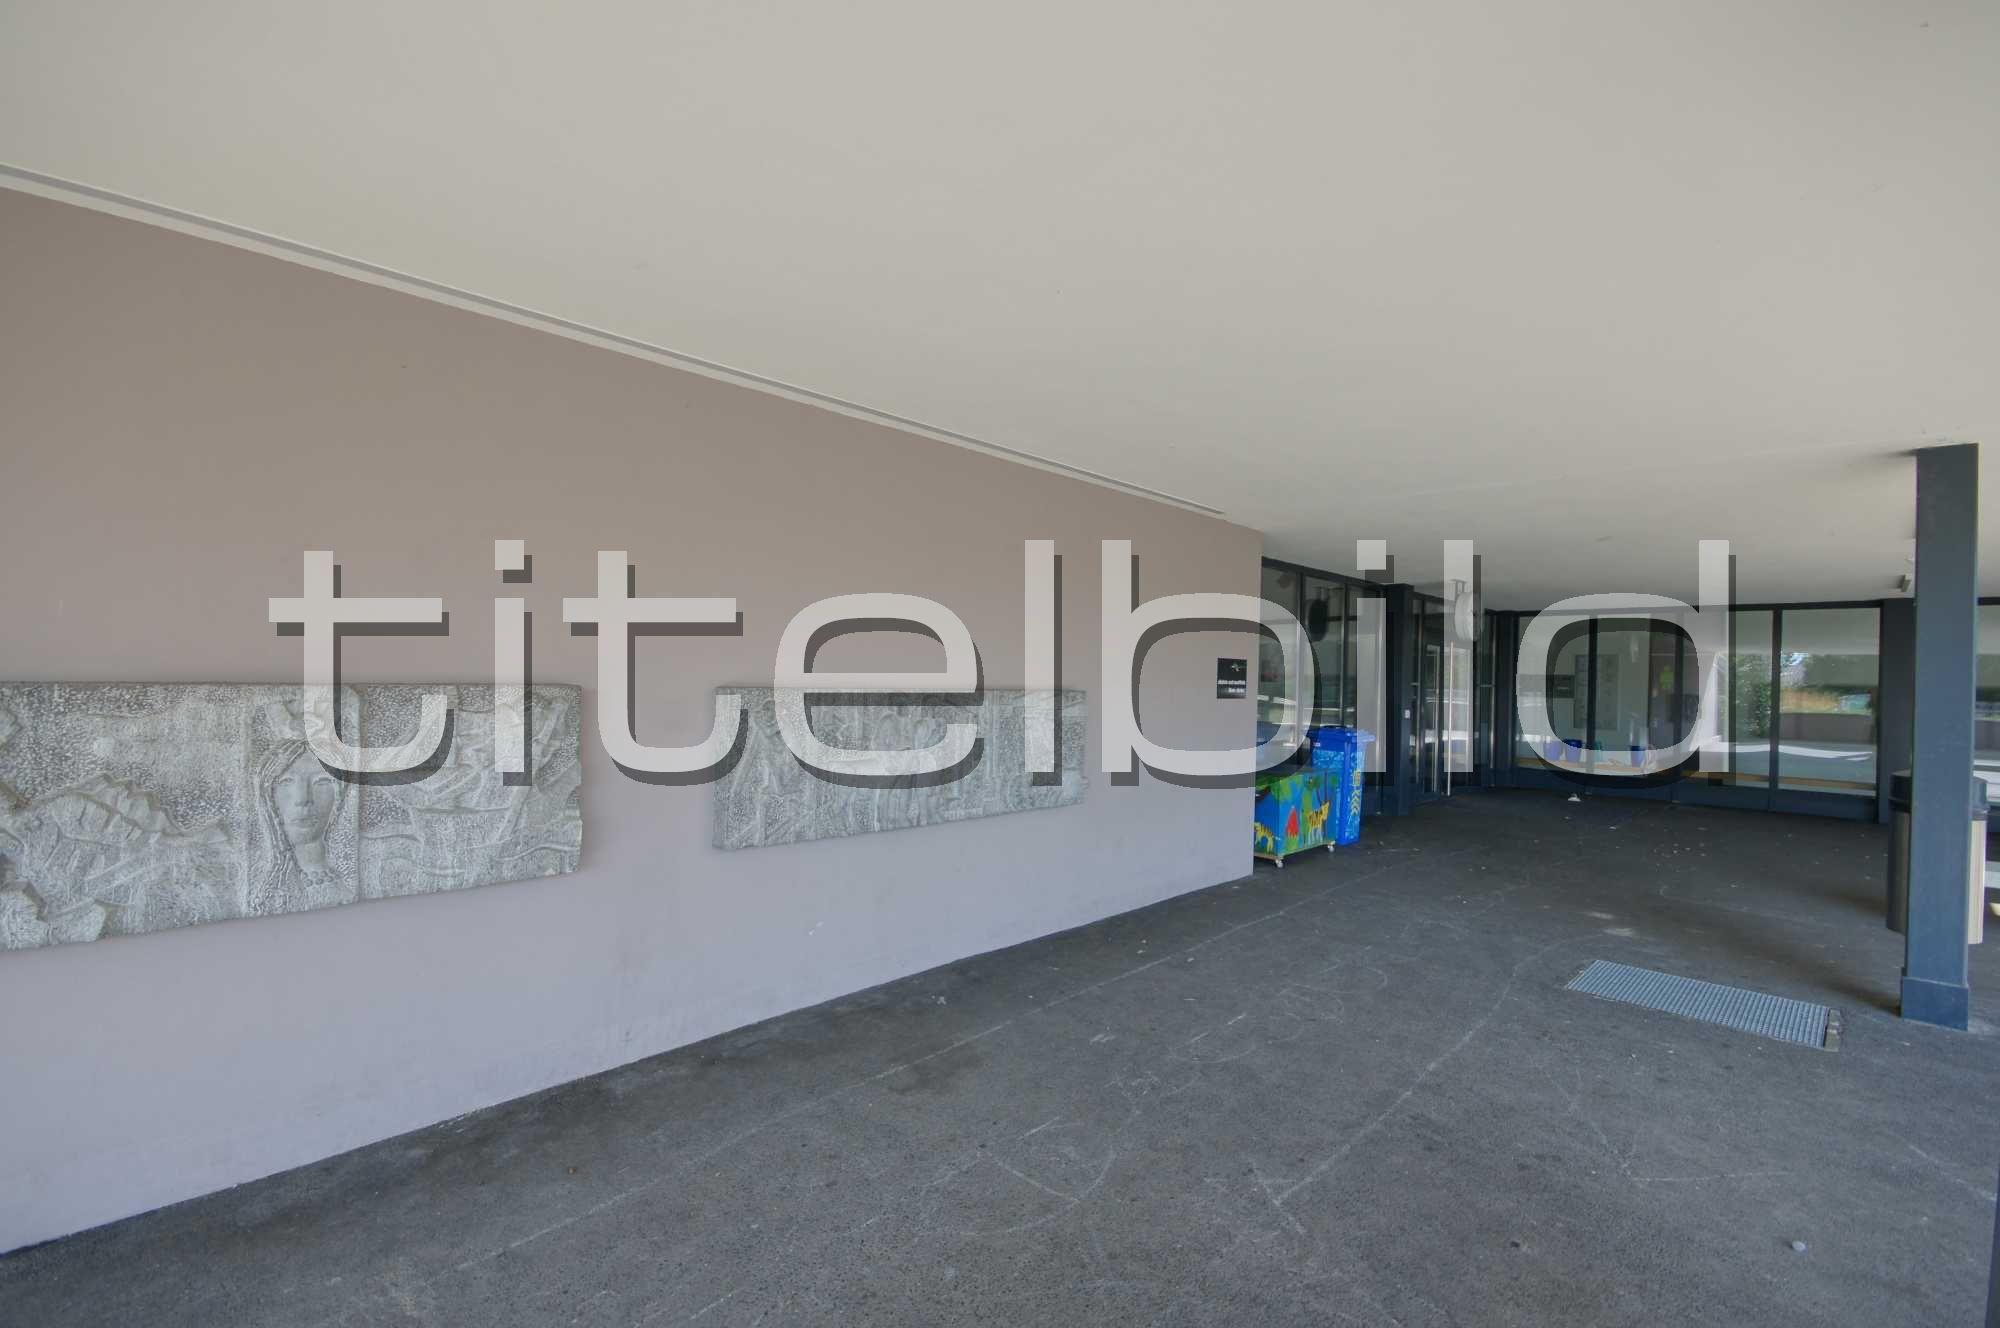 Projektbild-Nr. 6: Schulhaus Hermolingen